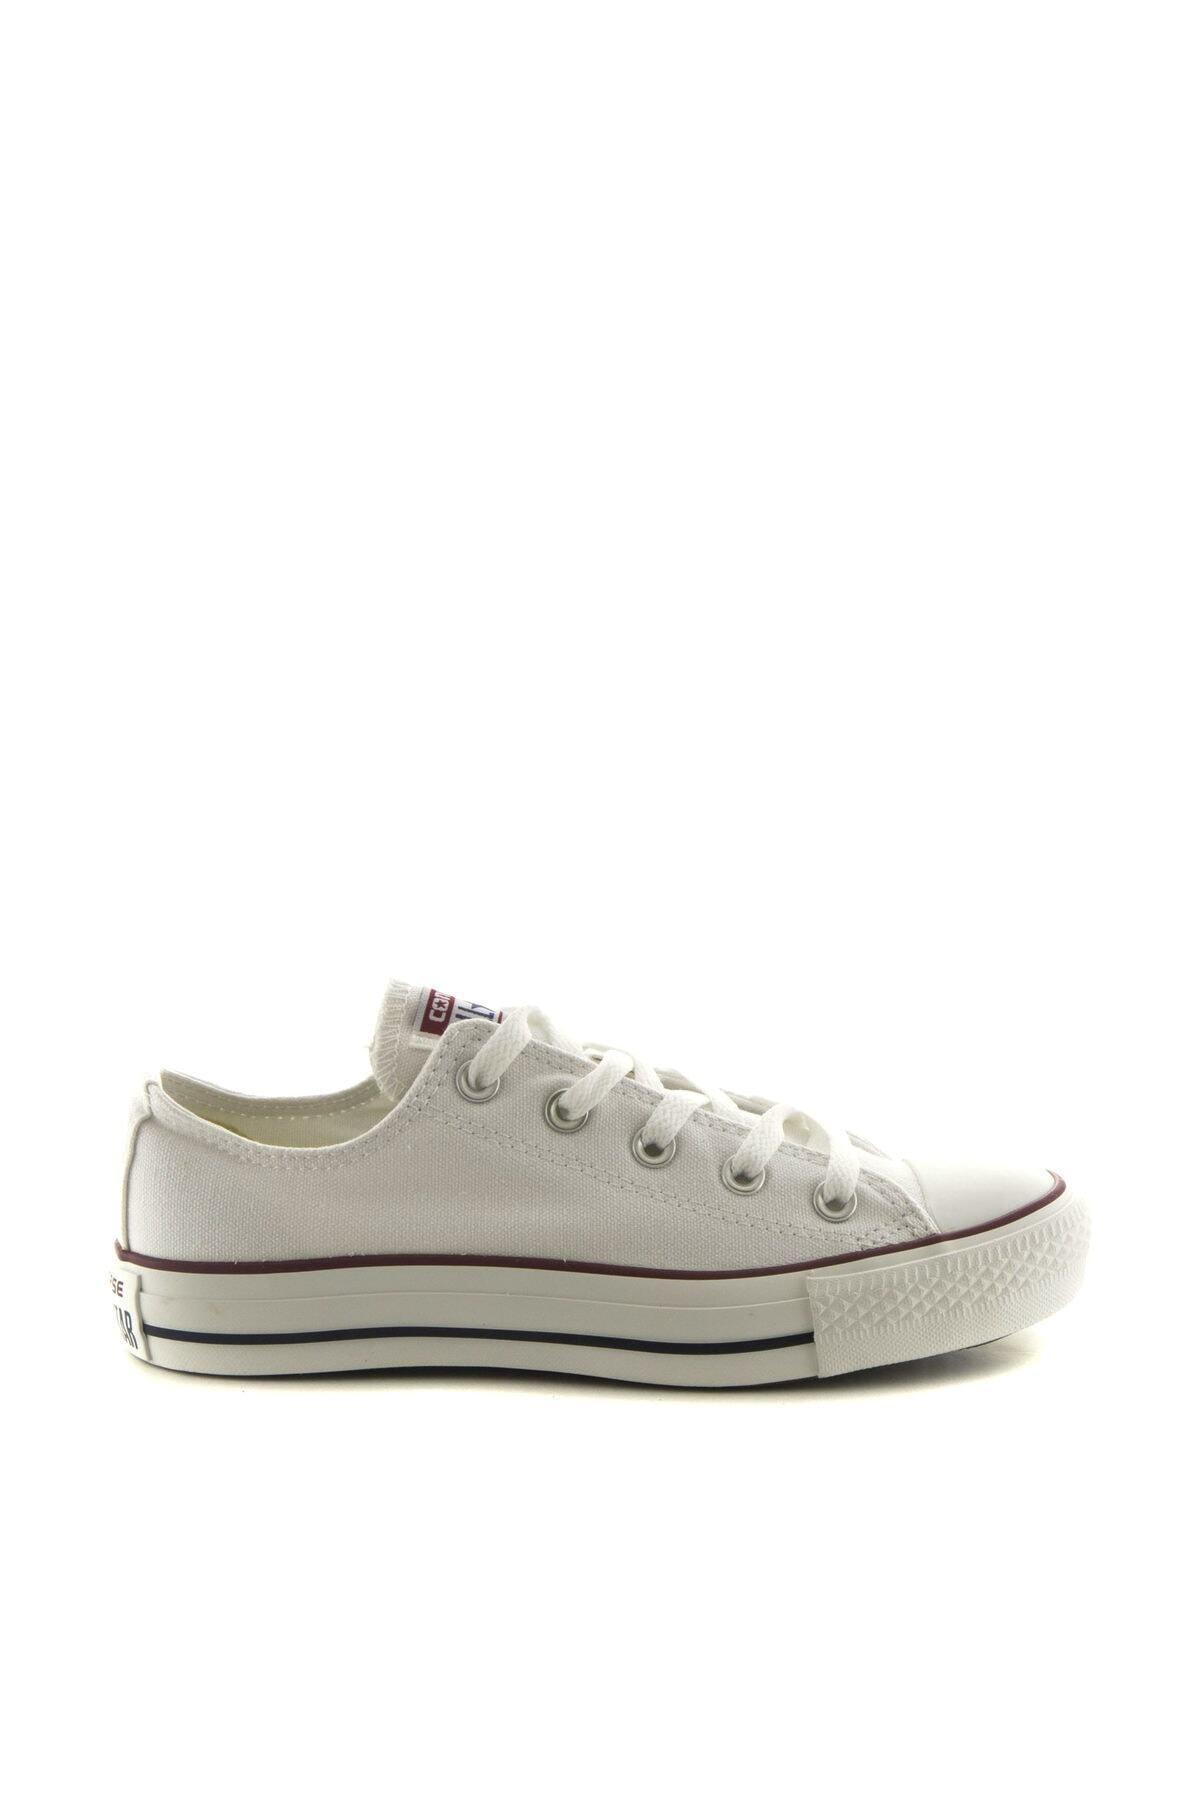 converse Ayakkabı Chuck Taylor All Star M7652C 1